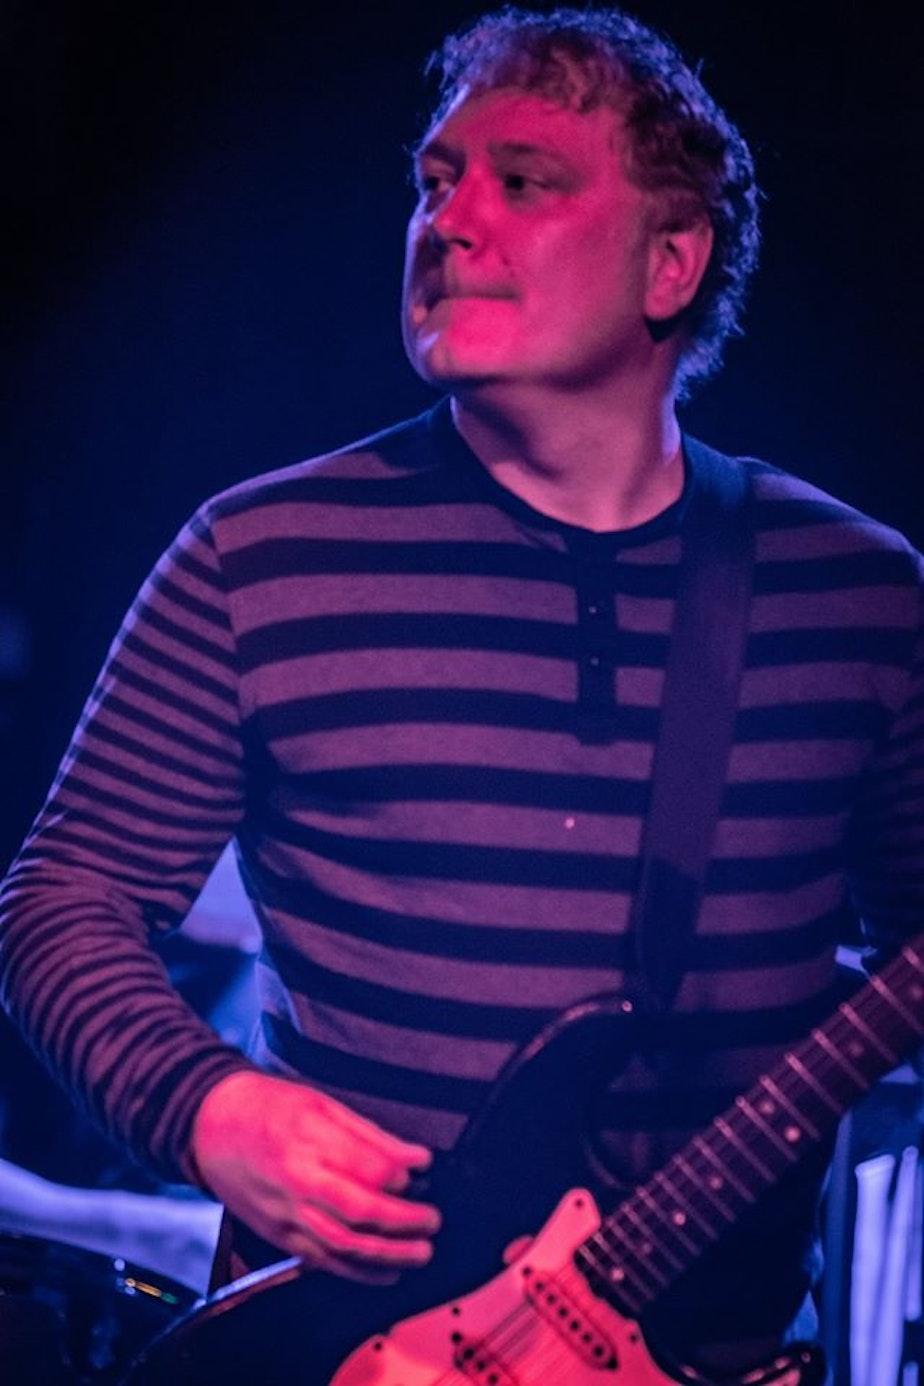 caption: James Burdyshaw on guitar.